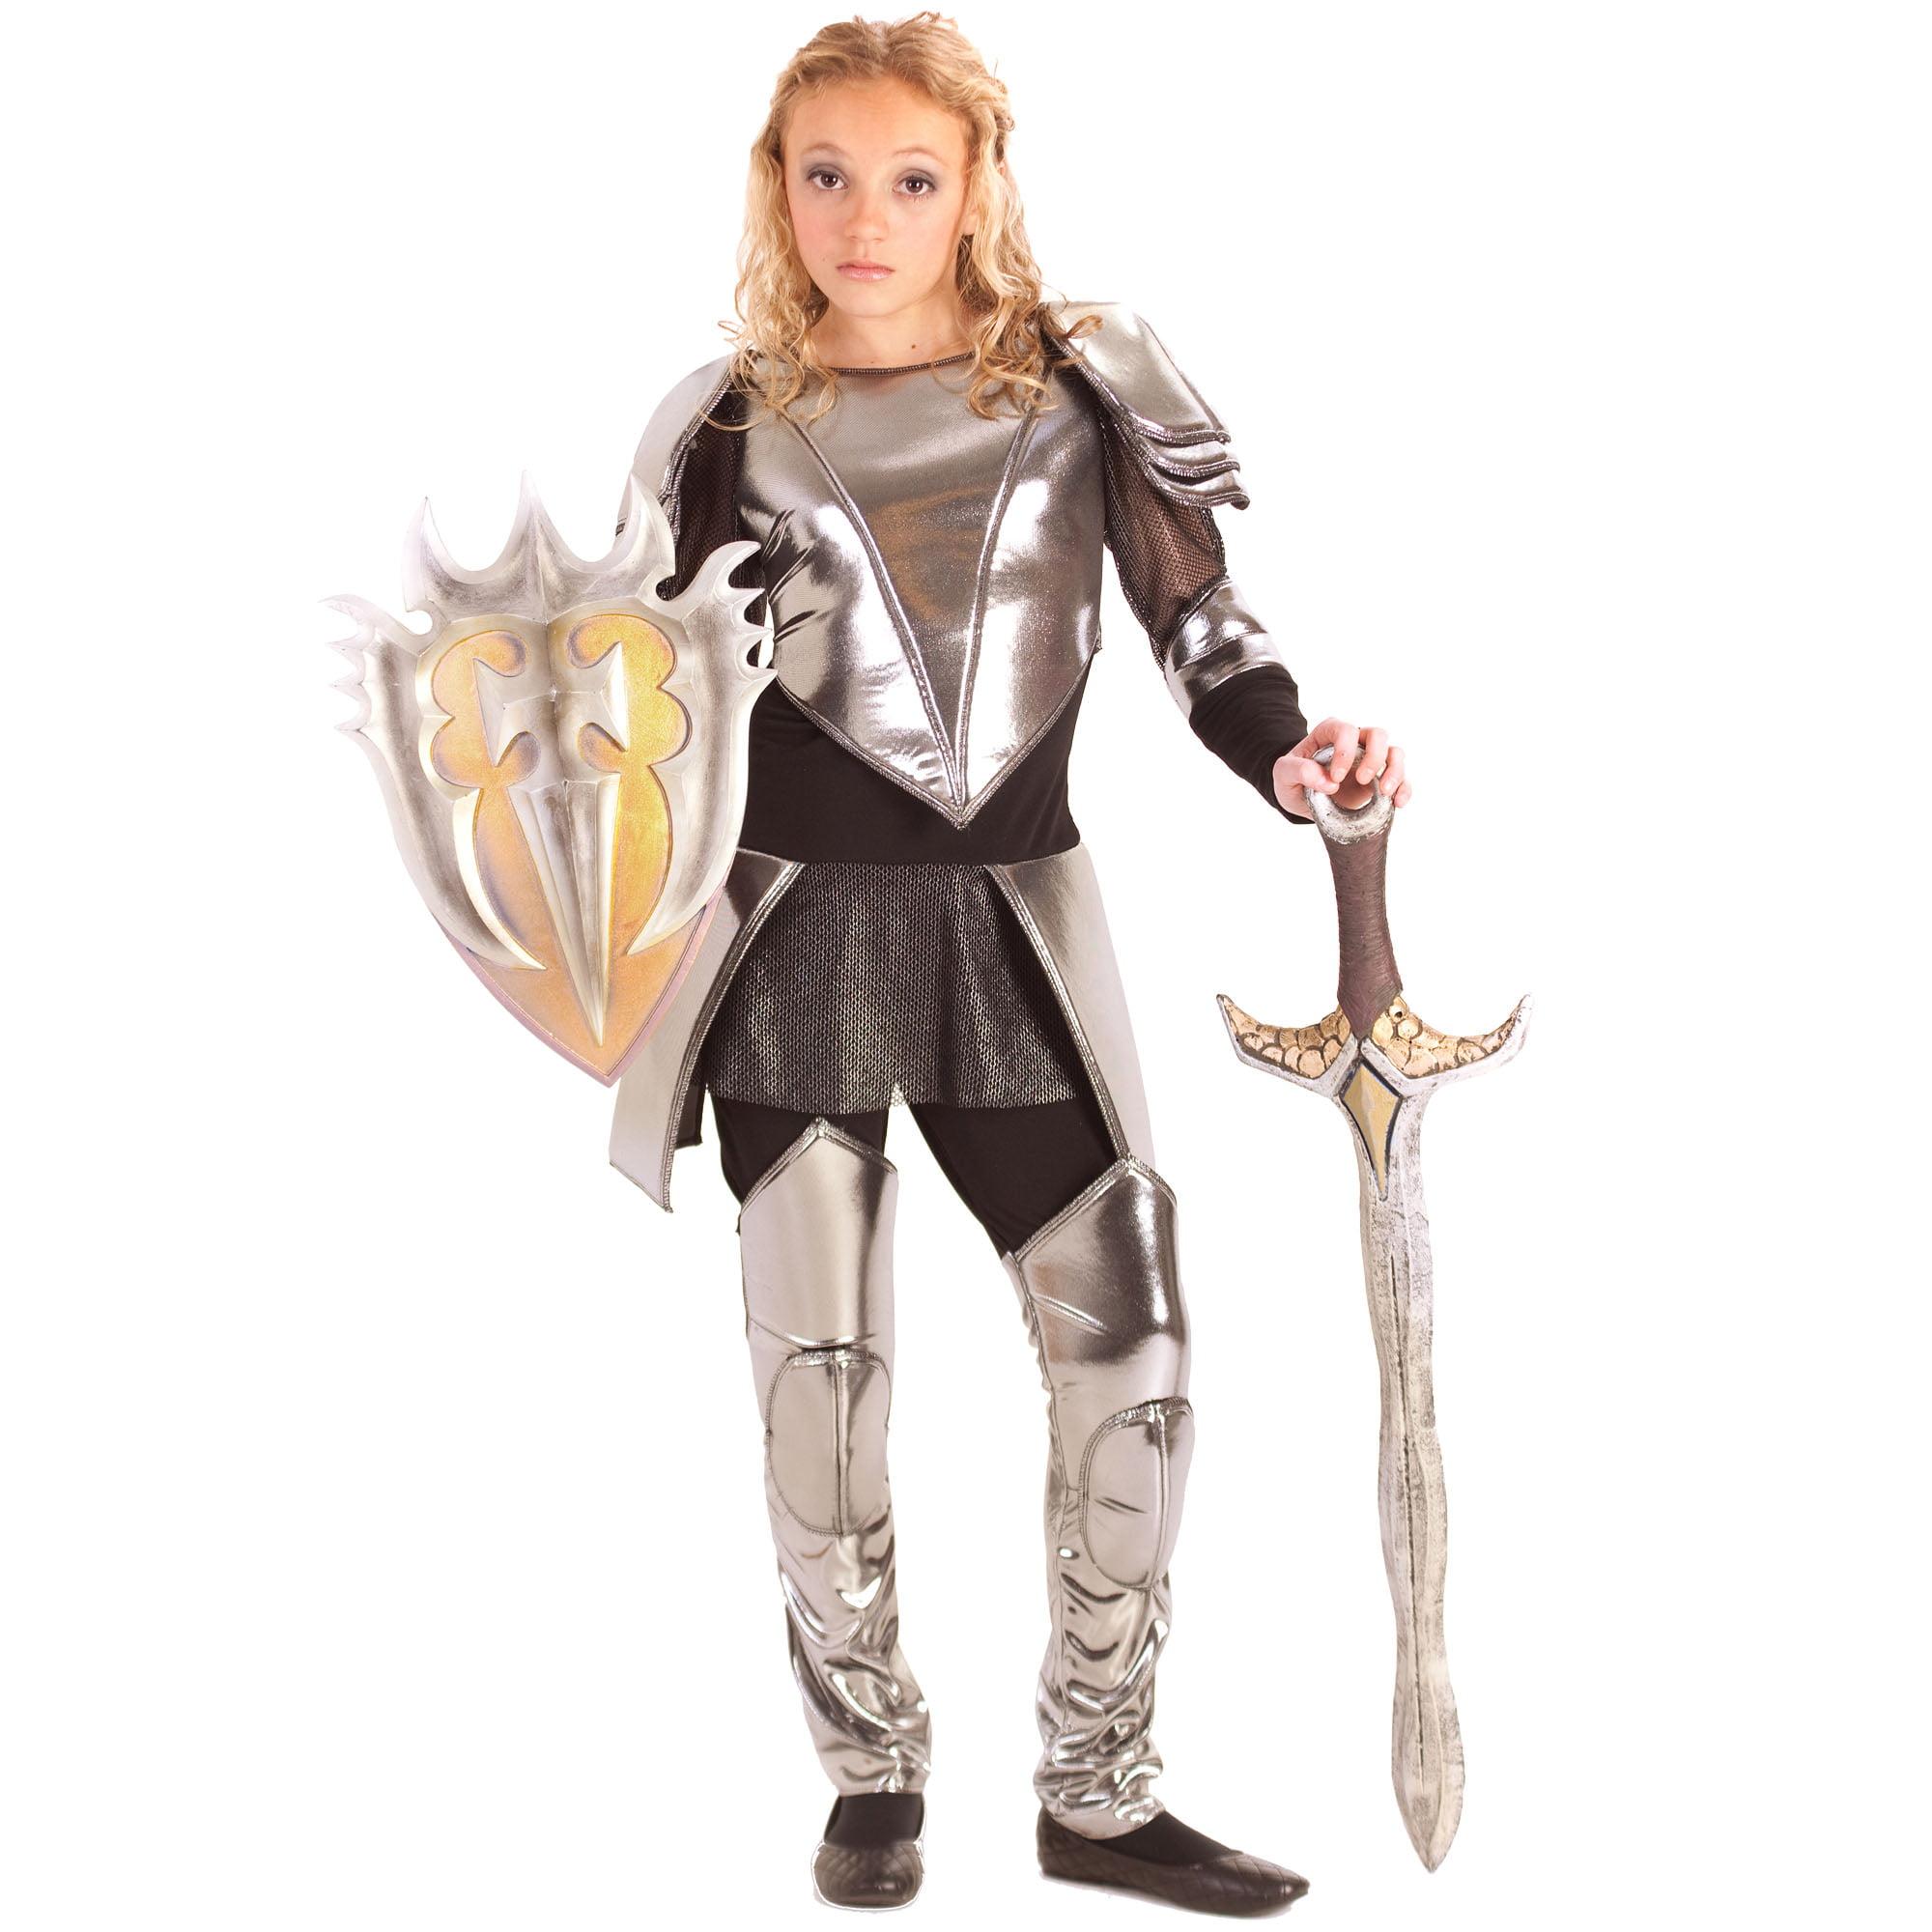 Princess Paradise Premium Warrior Snow Tween Costume